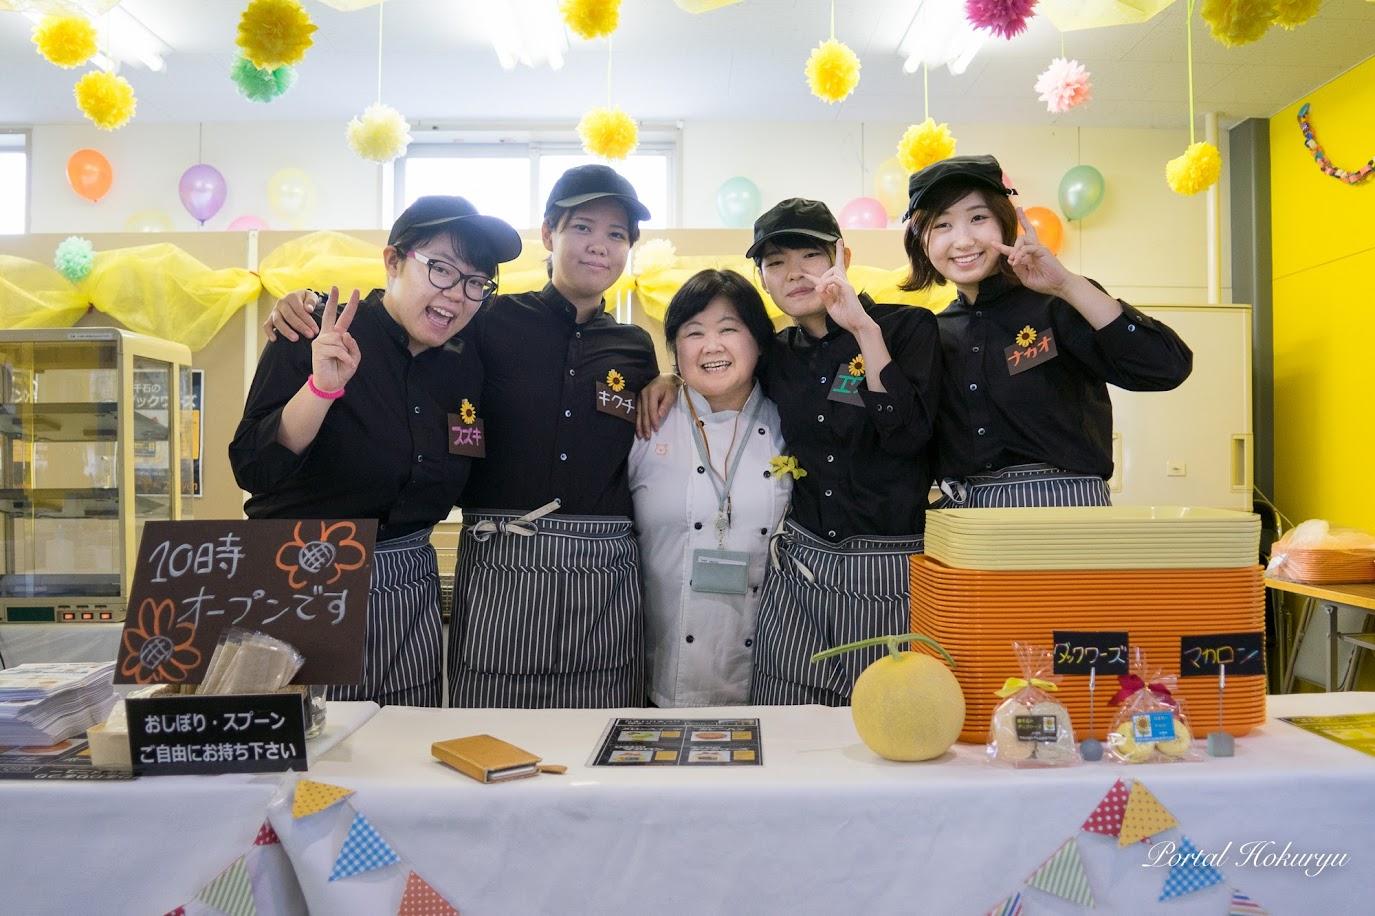 宮島学園北海道製菓専門学校・藤田真由美先生と生徒さんたち